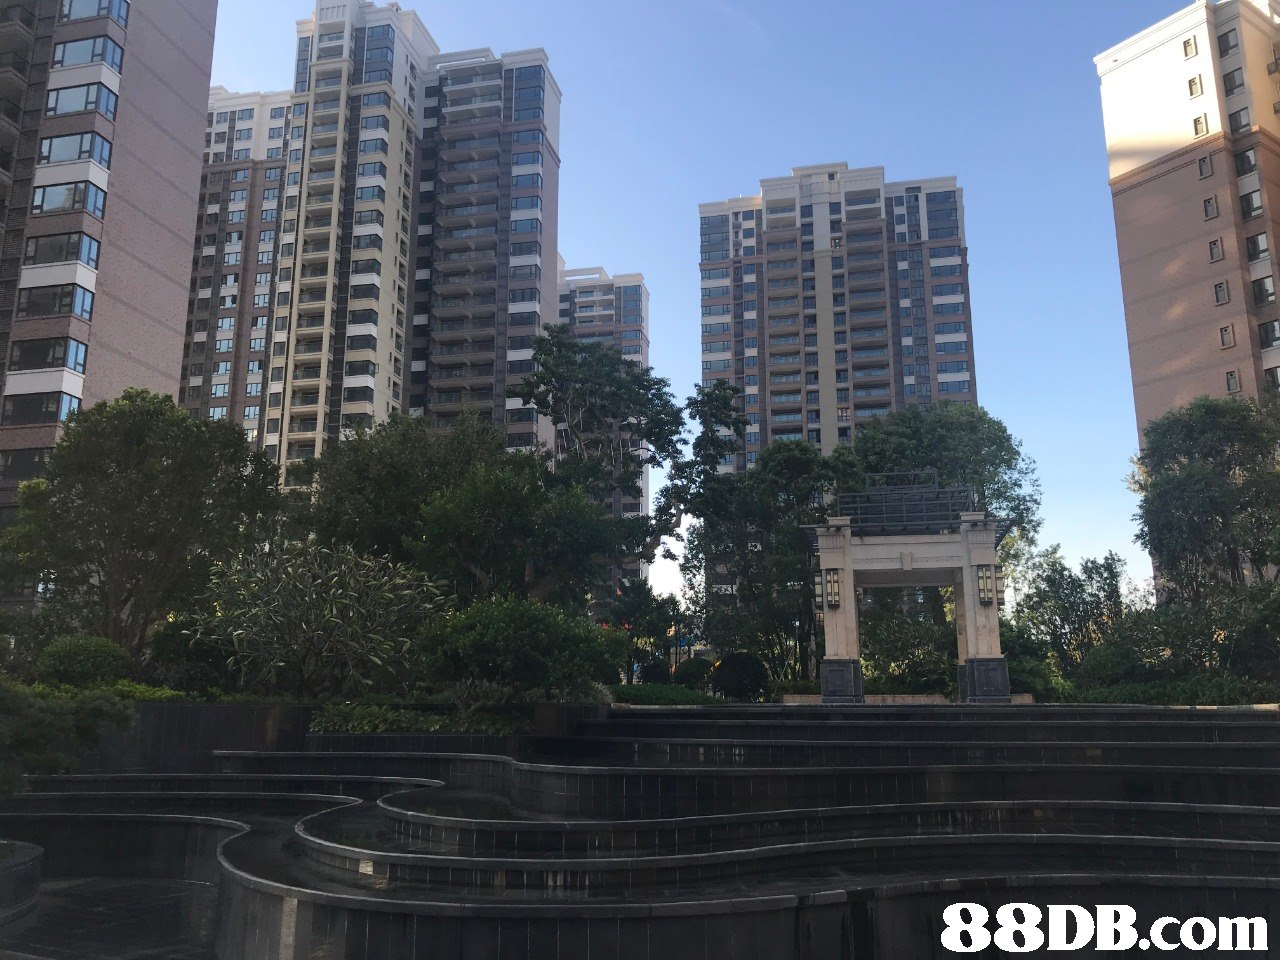 metropolitan area,condominium,building,skyscraper,tower block